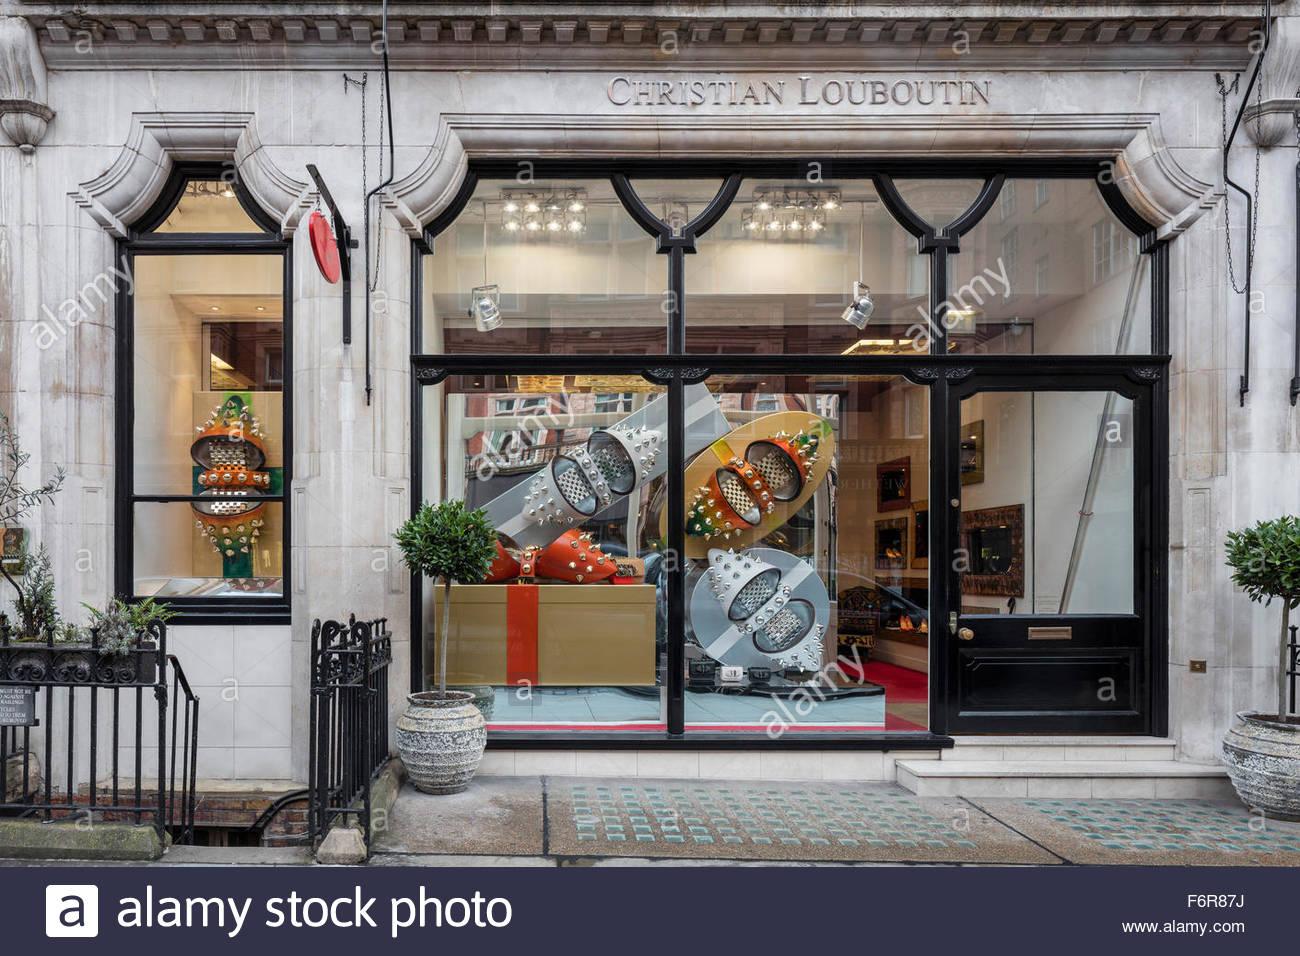 667366a7652 Store Windows view. Christian Louboutin - Christmas 2015, London ...